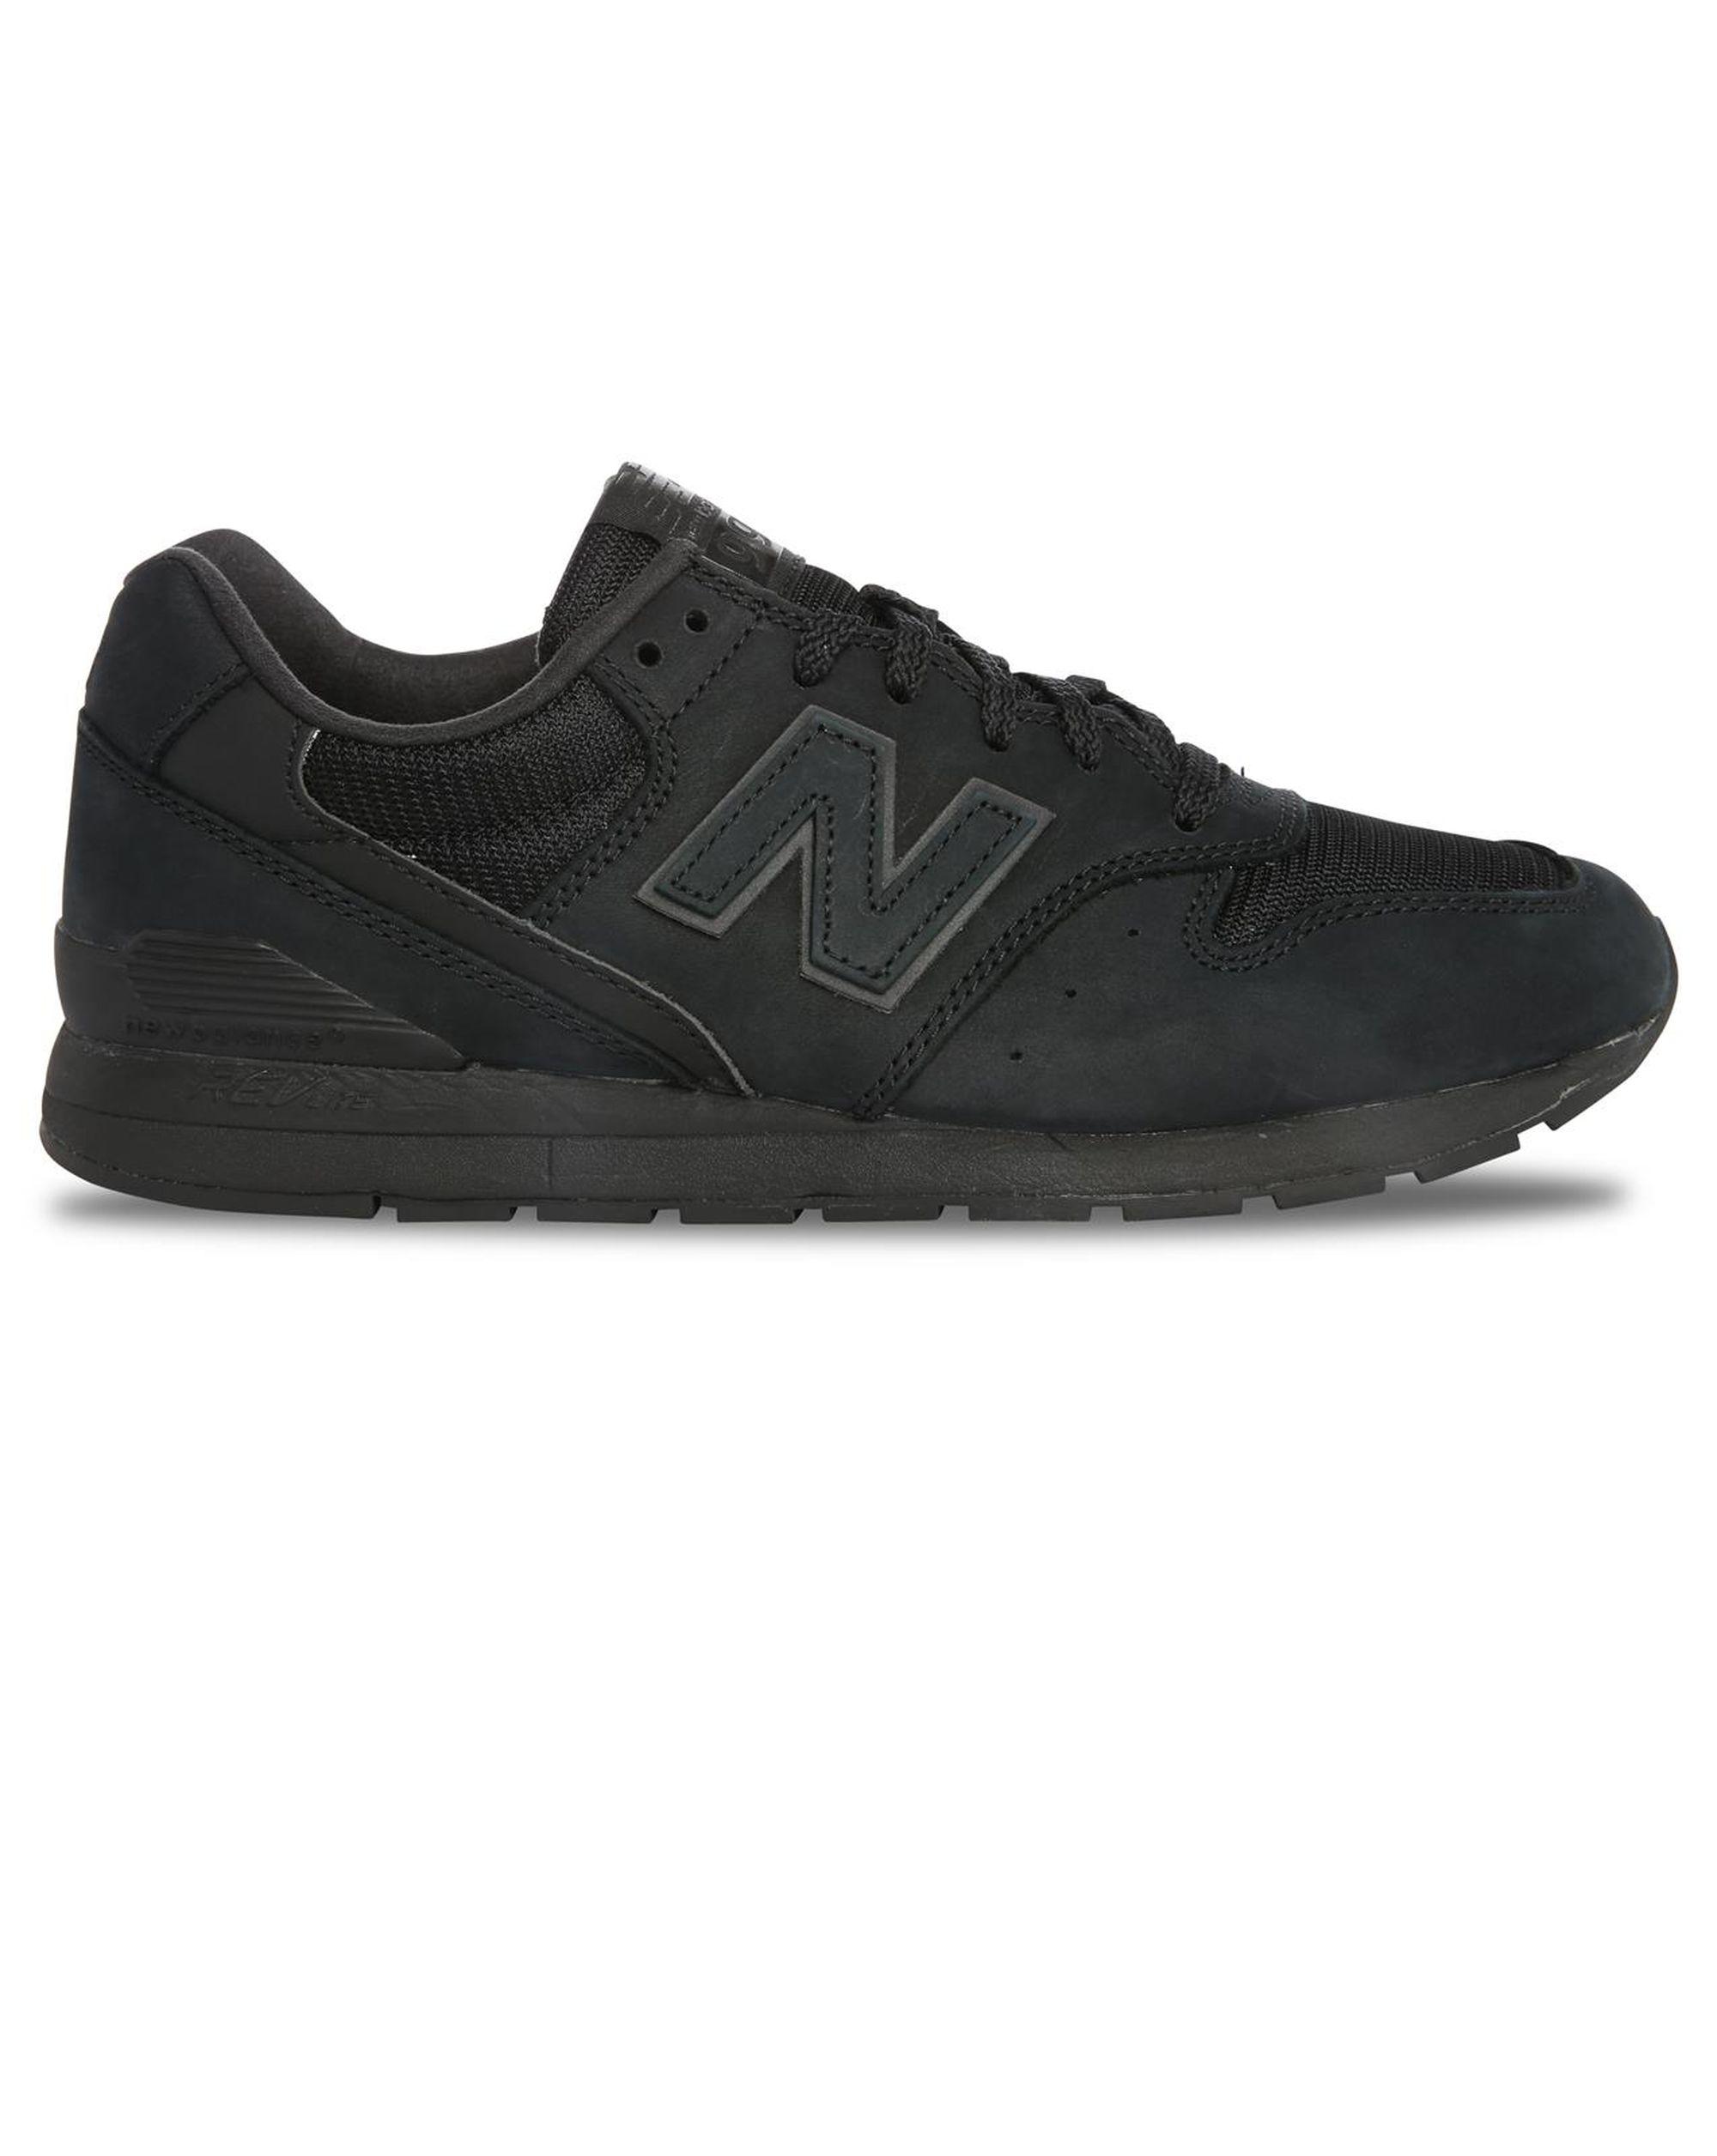 new balance black 996 suede mesh sneakers in black for men lyst. Black Bedroom Furniture Sets. Home Design Ideas